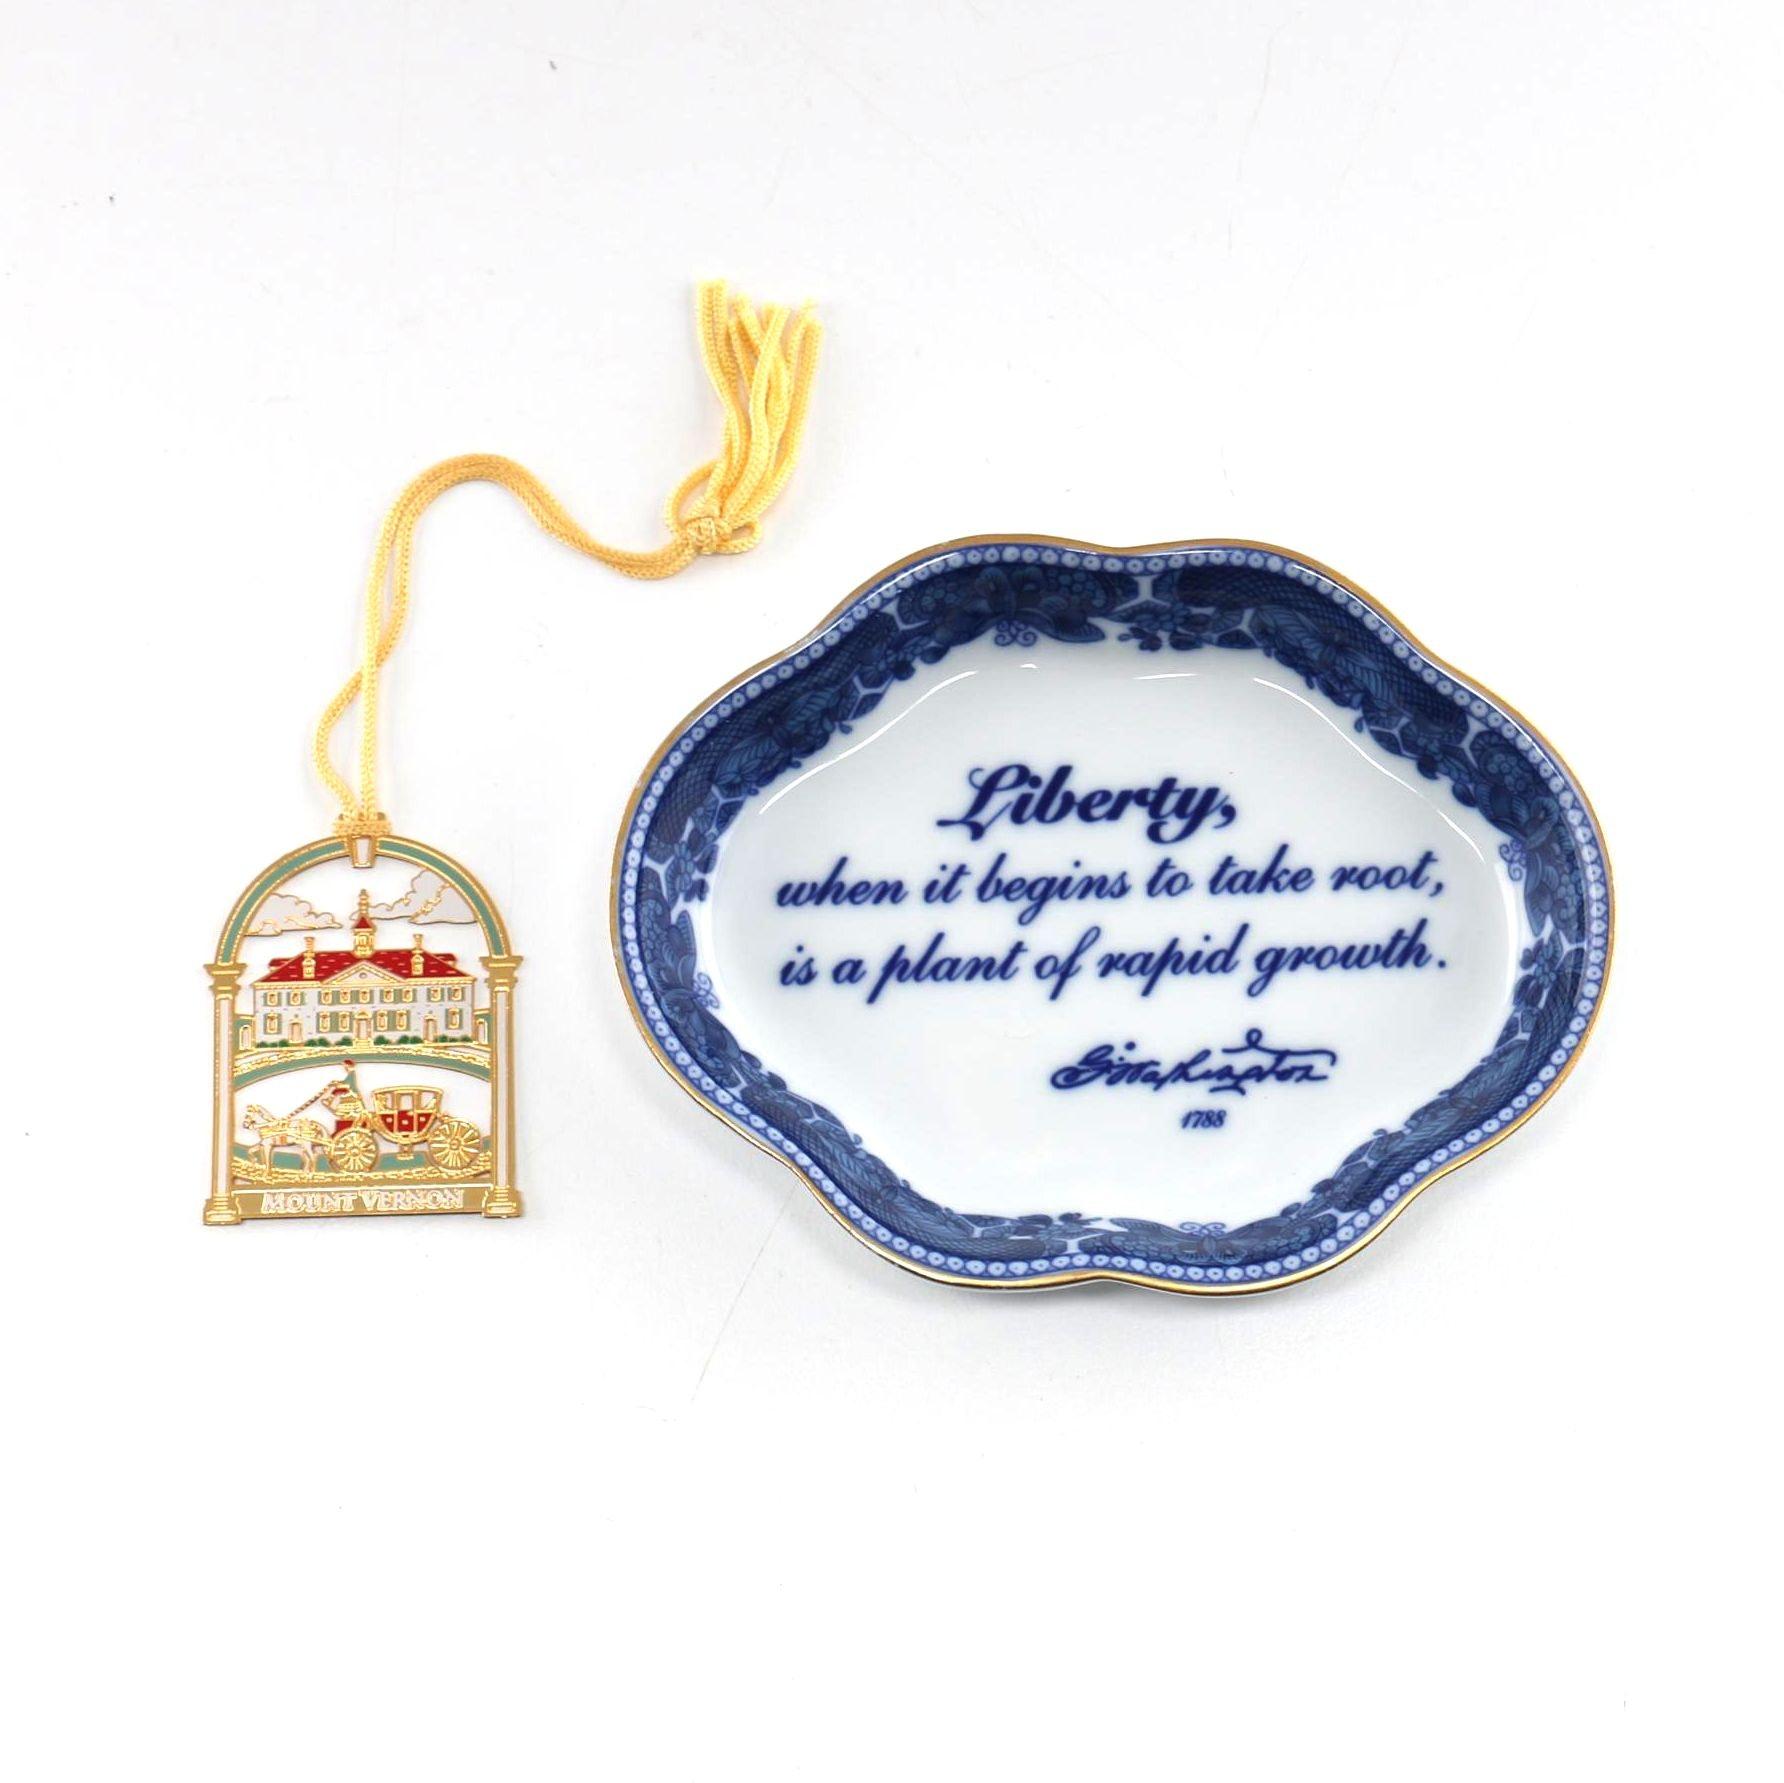 Mount Vernon Ornament and Trinket Dish